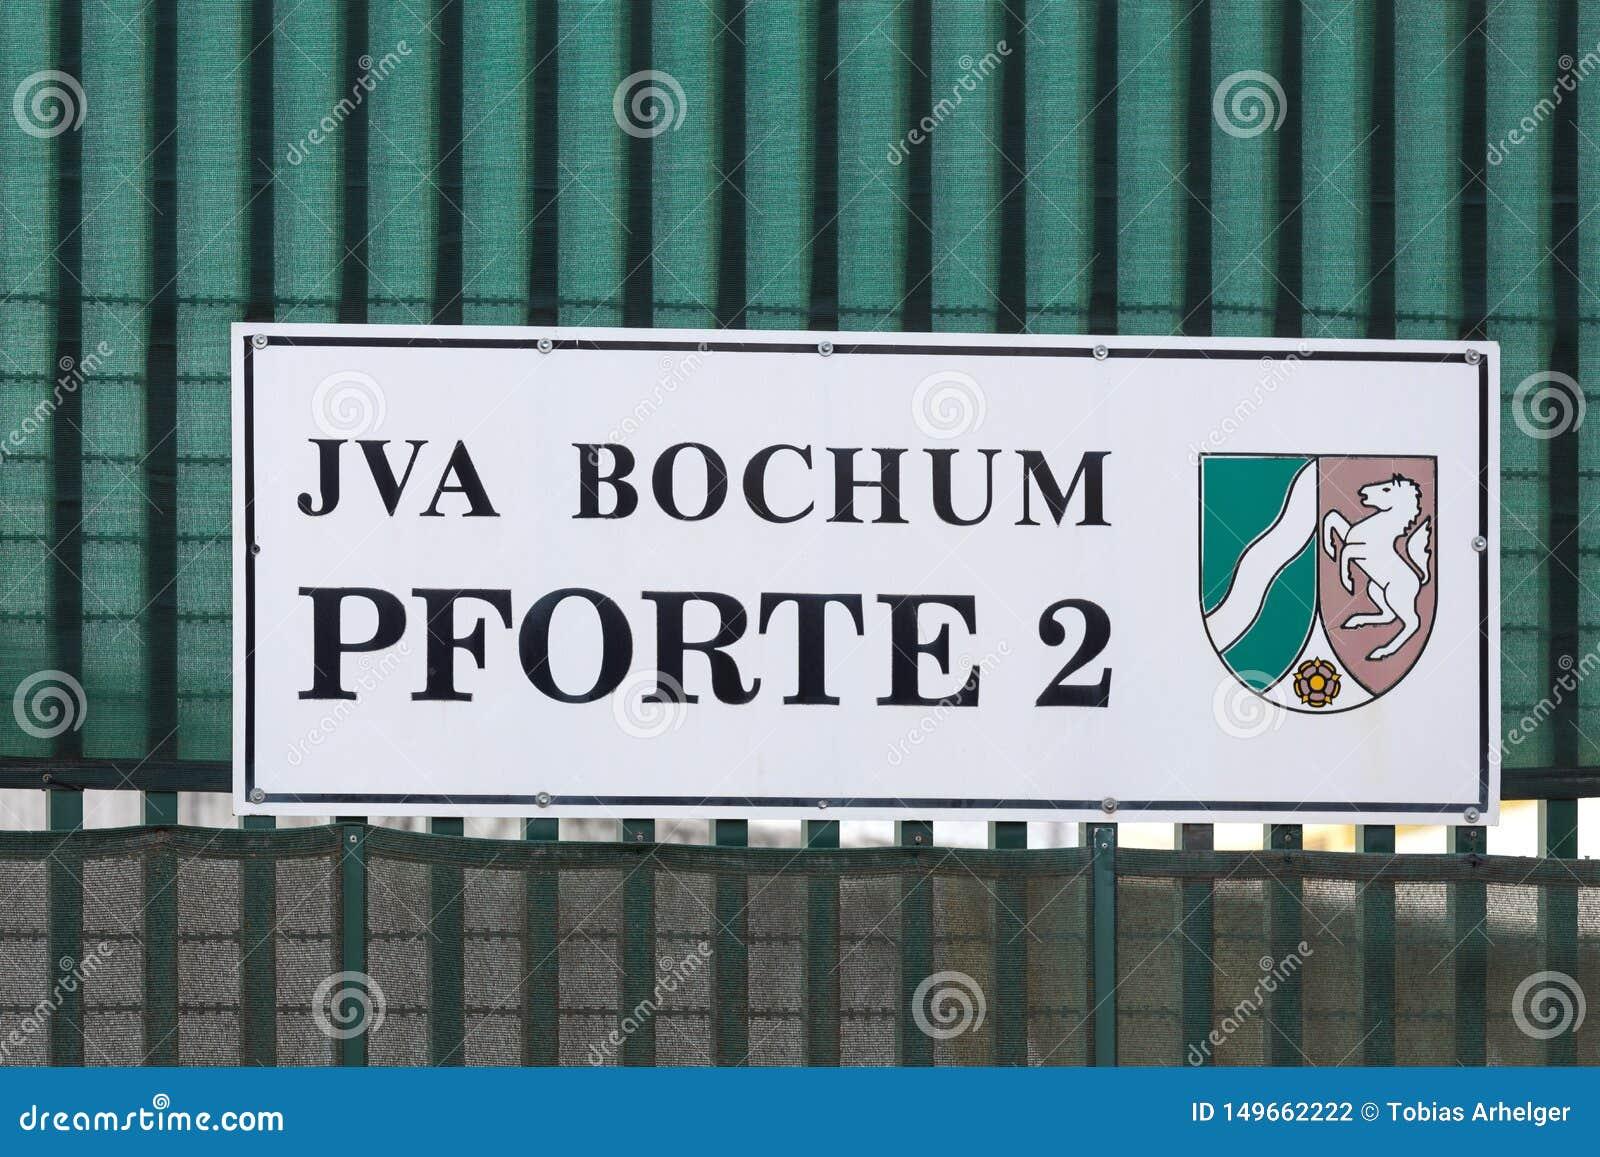 Jva bochum sign in bochum germany